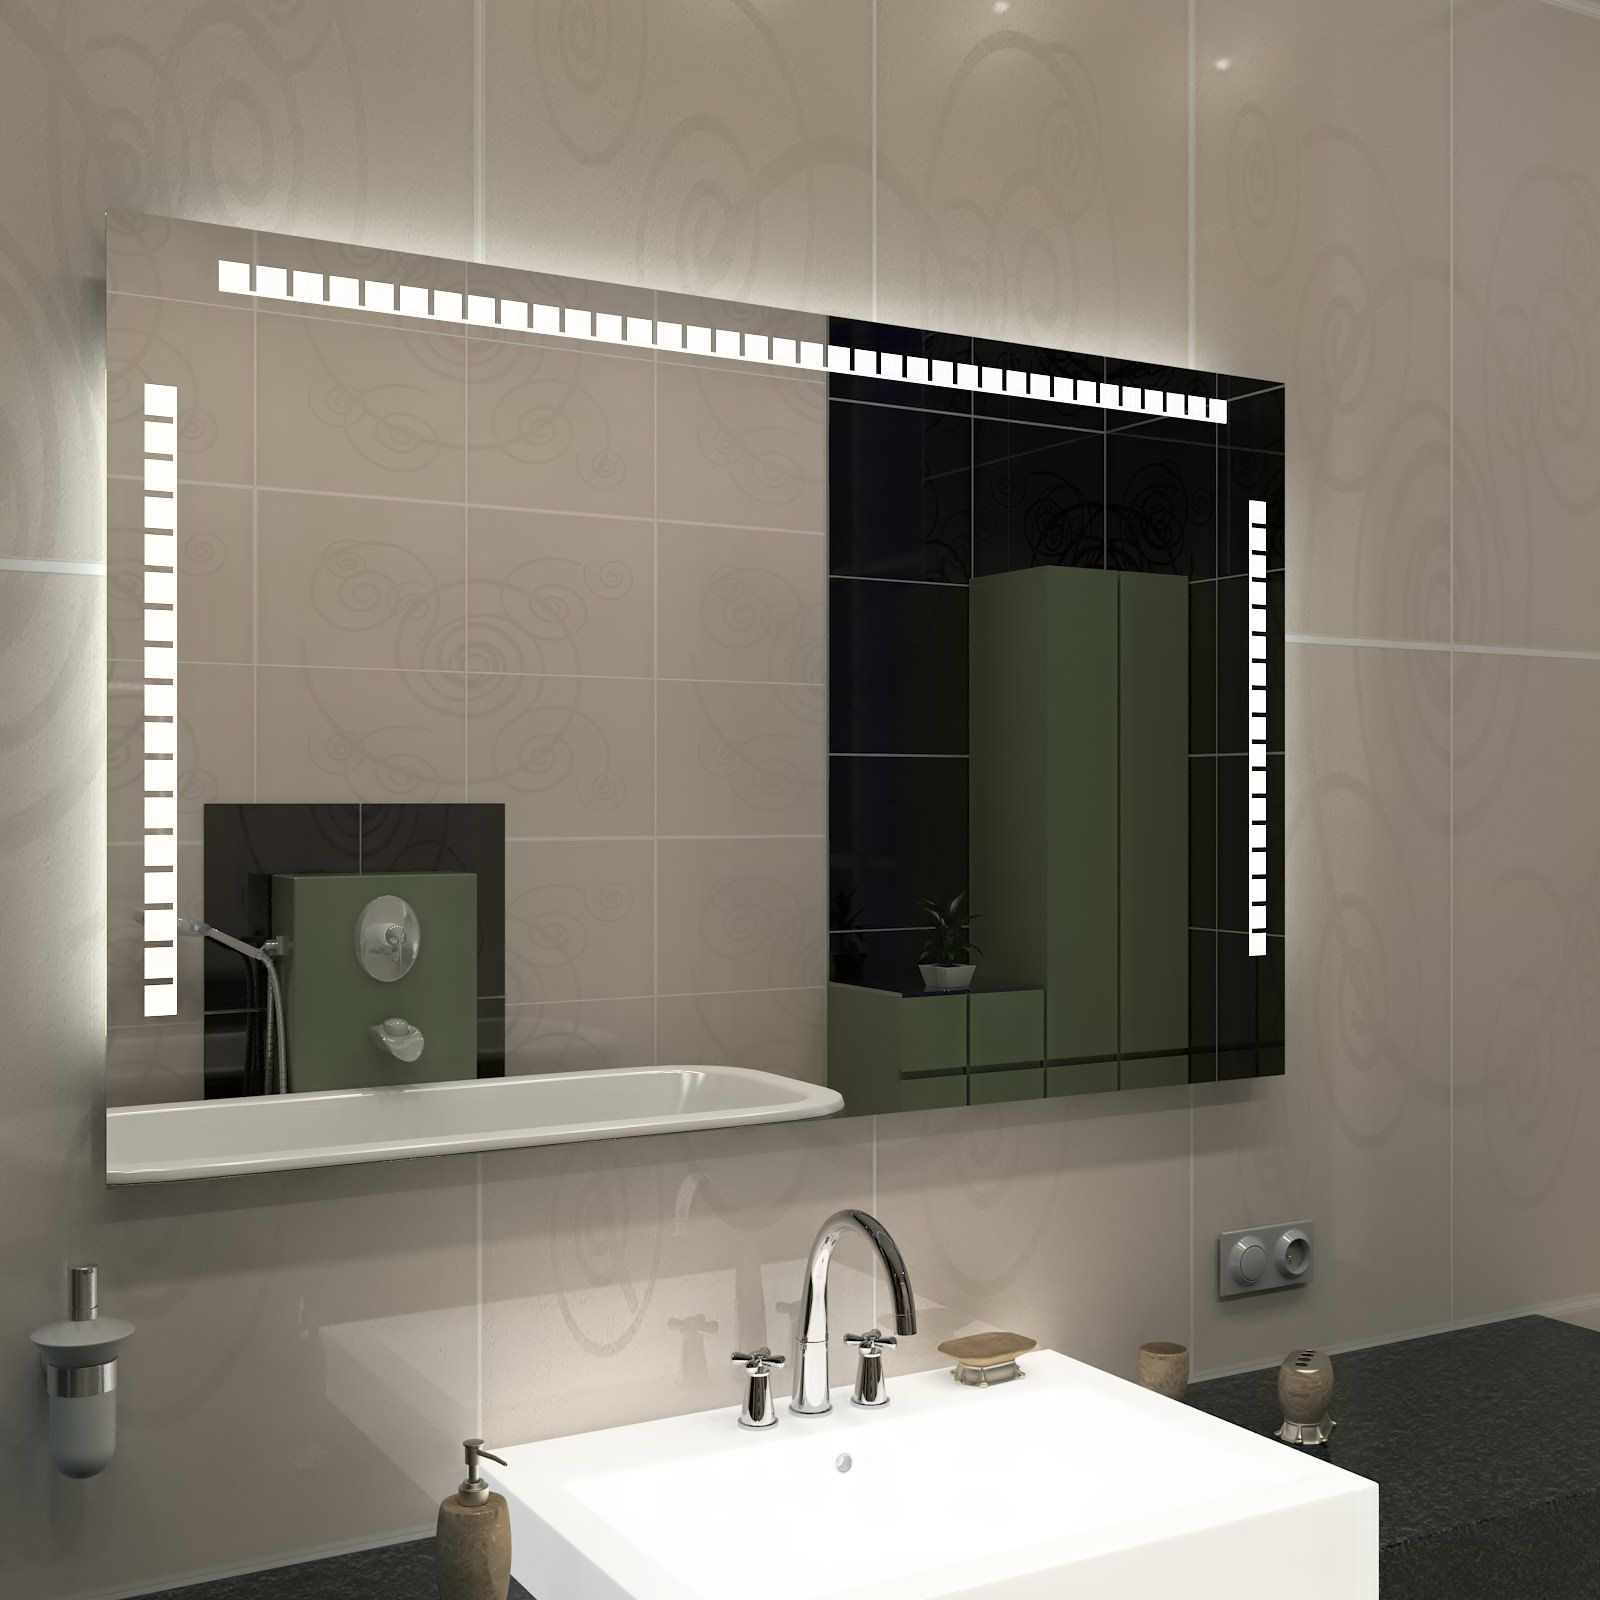 Ayna Ve Banyo Aynalari Fiyatlari Ayna Modelleri Com Badspiegel Spiegel Mit Beleuchtung Und Spiegel